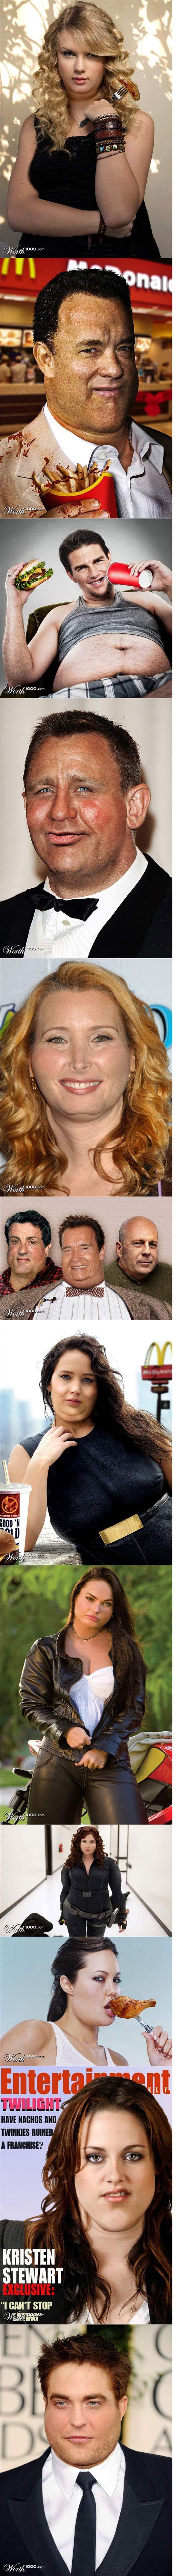 If celebrities were fat. .. Robert Fattison. Fat mo fuckas